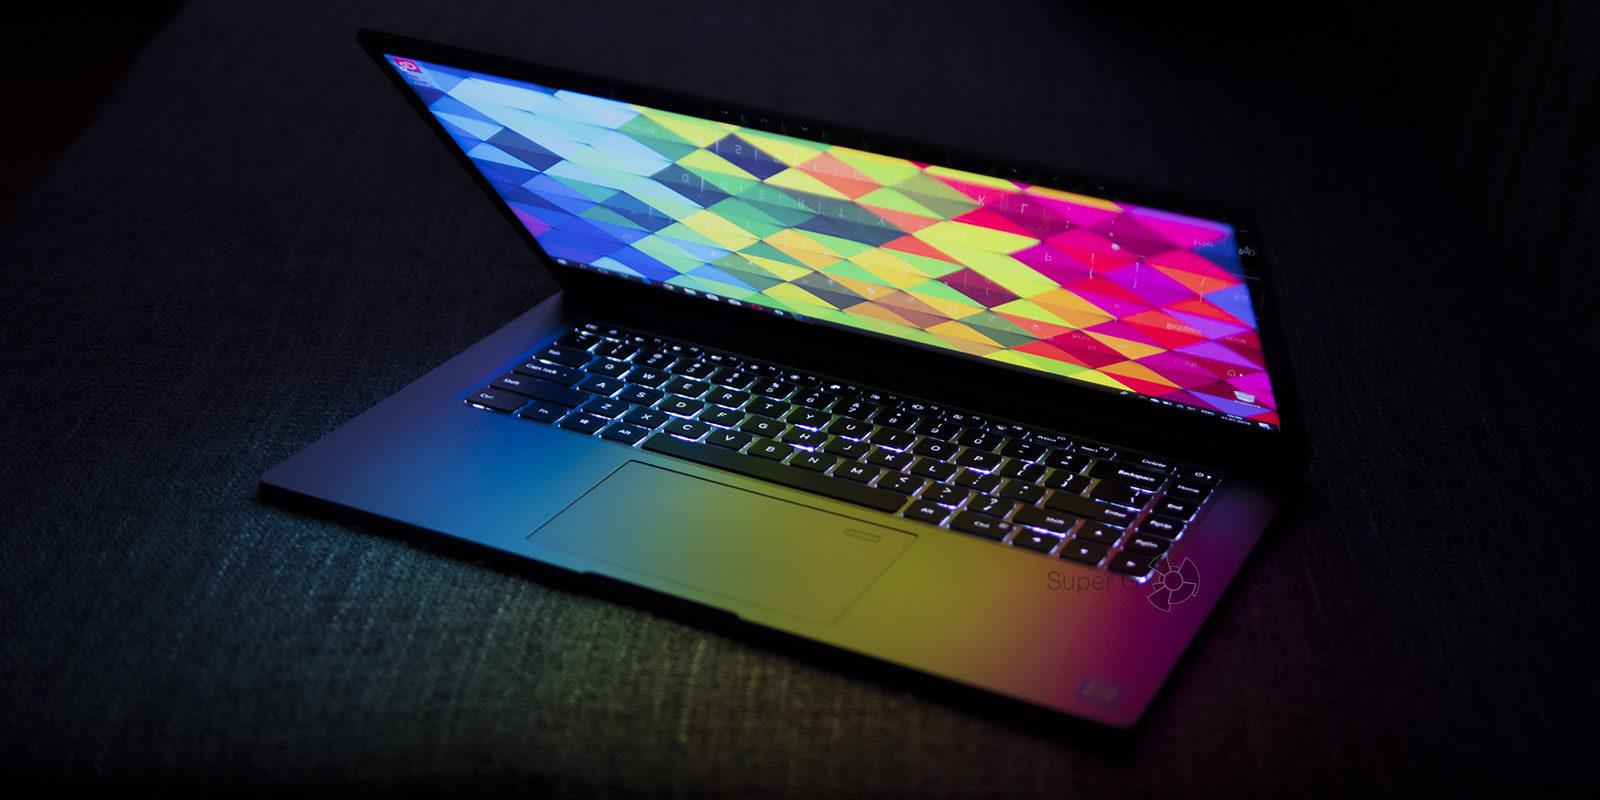 Обзор ноутбука Xiaomi Mi Notebook Pro i7